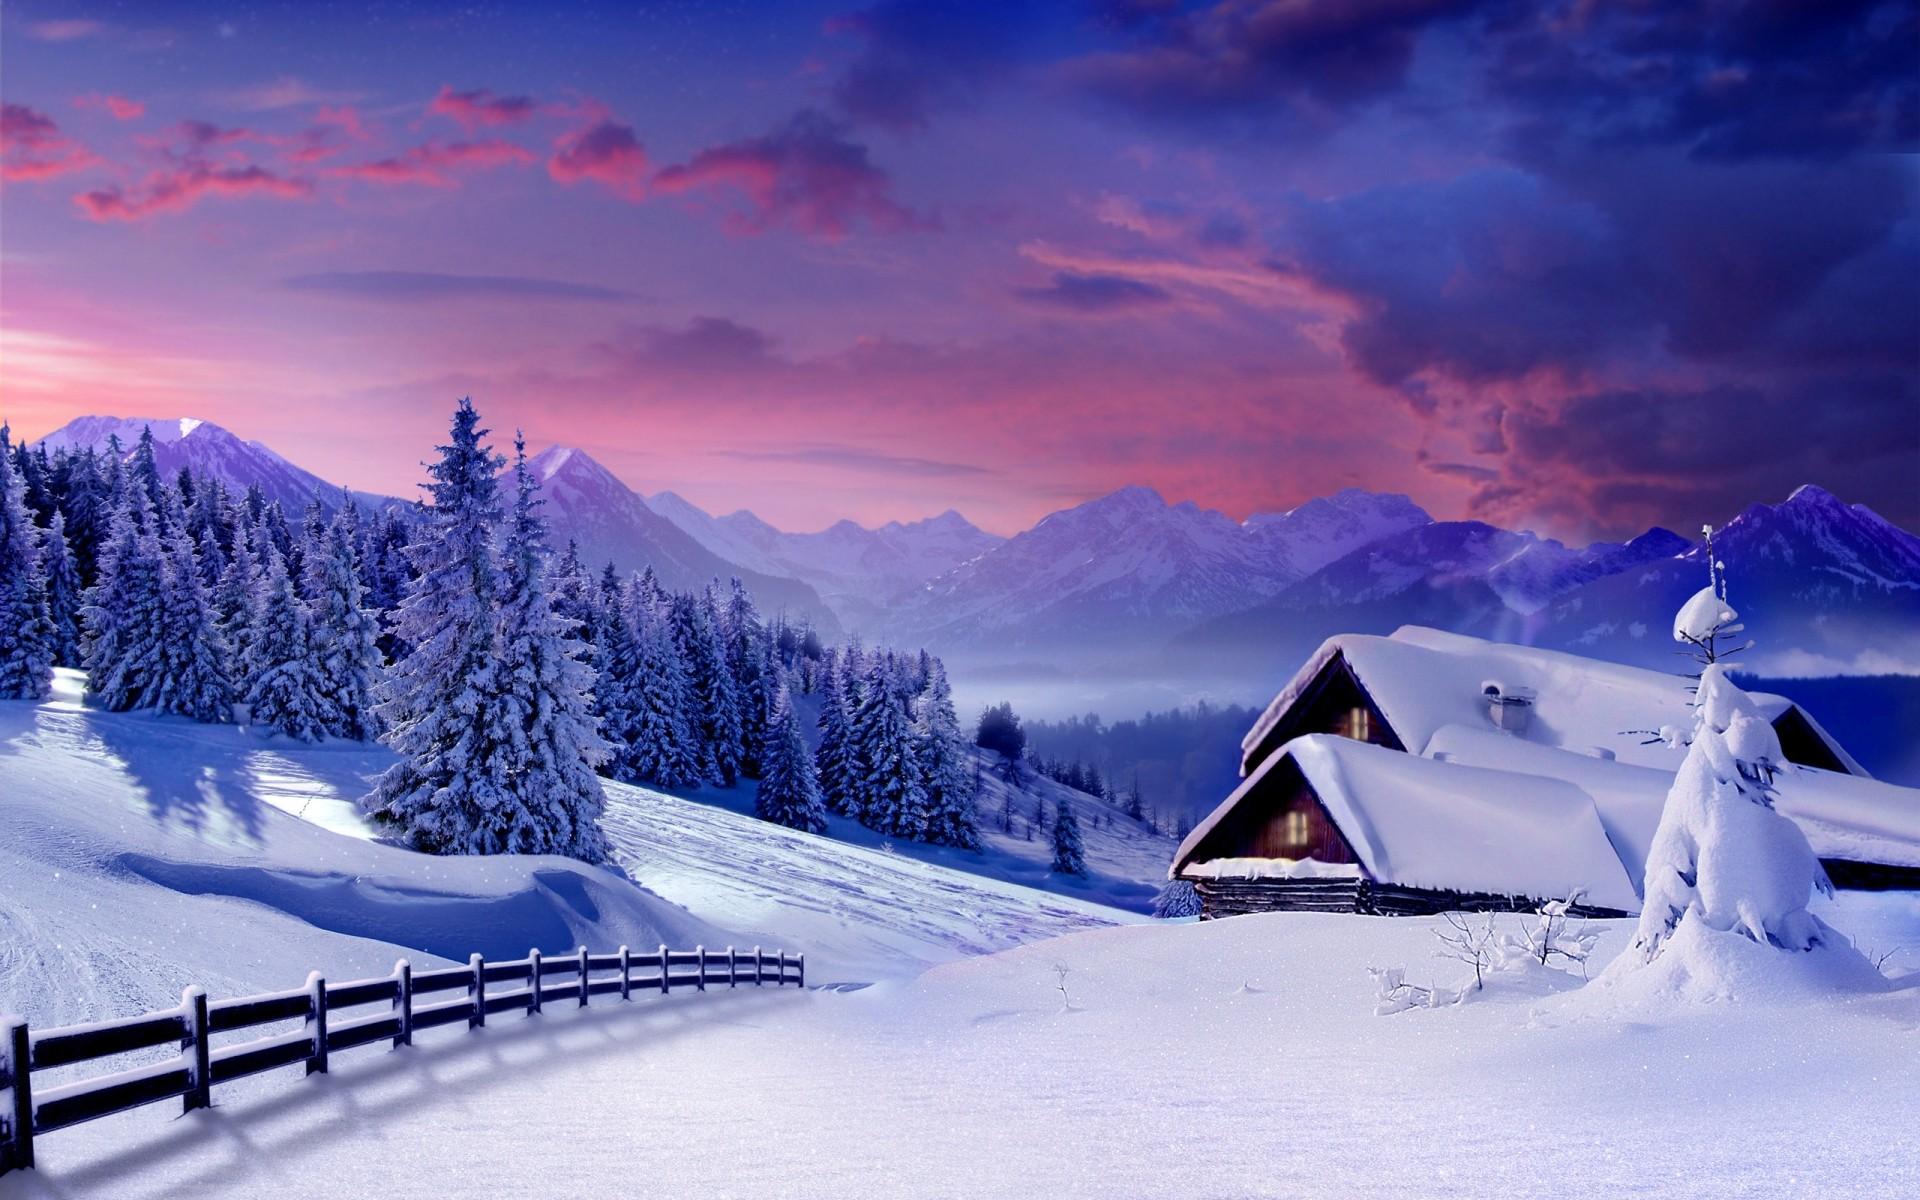 Картинки о зиме на рабочий стол